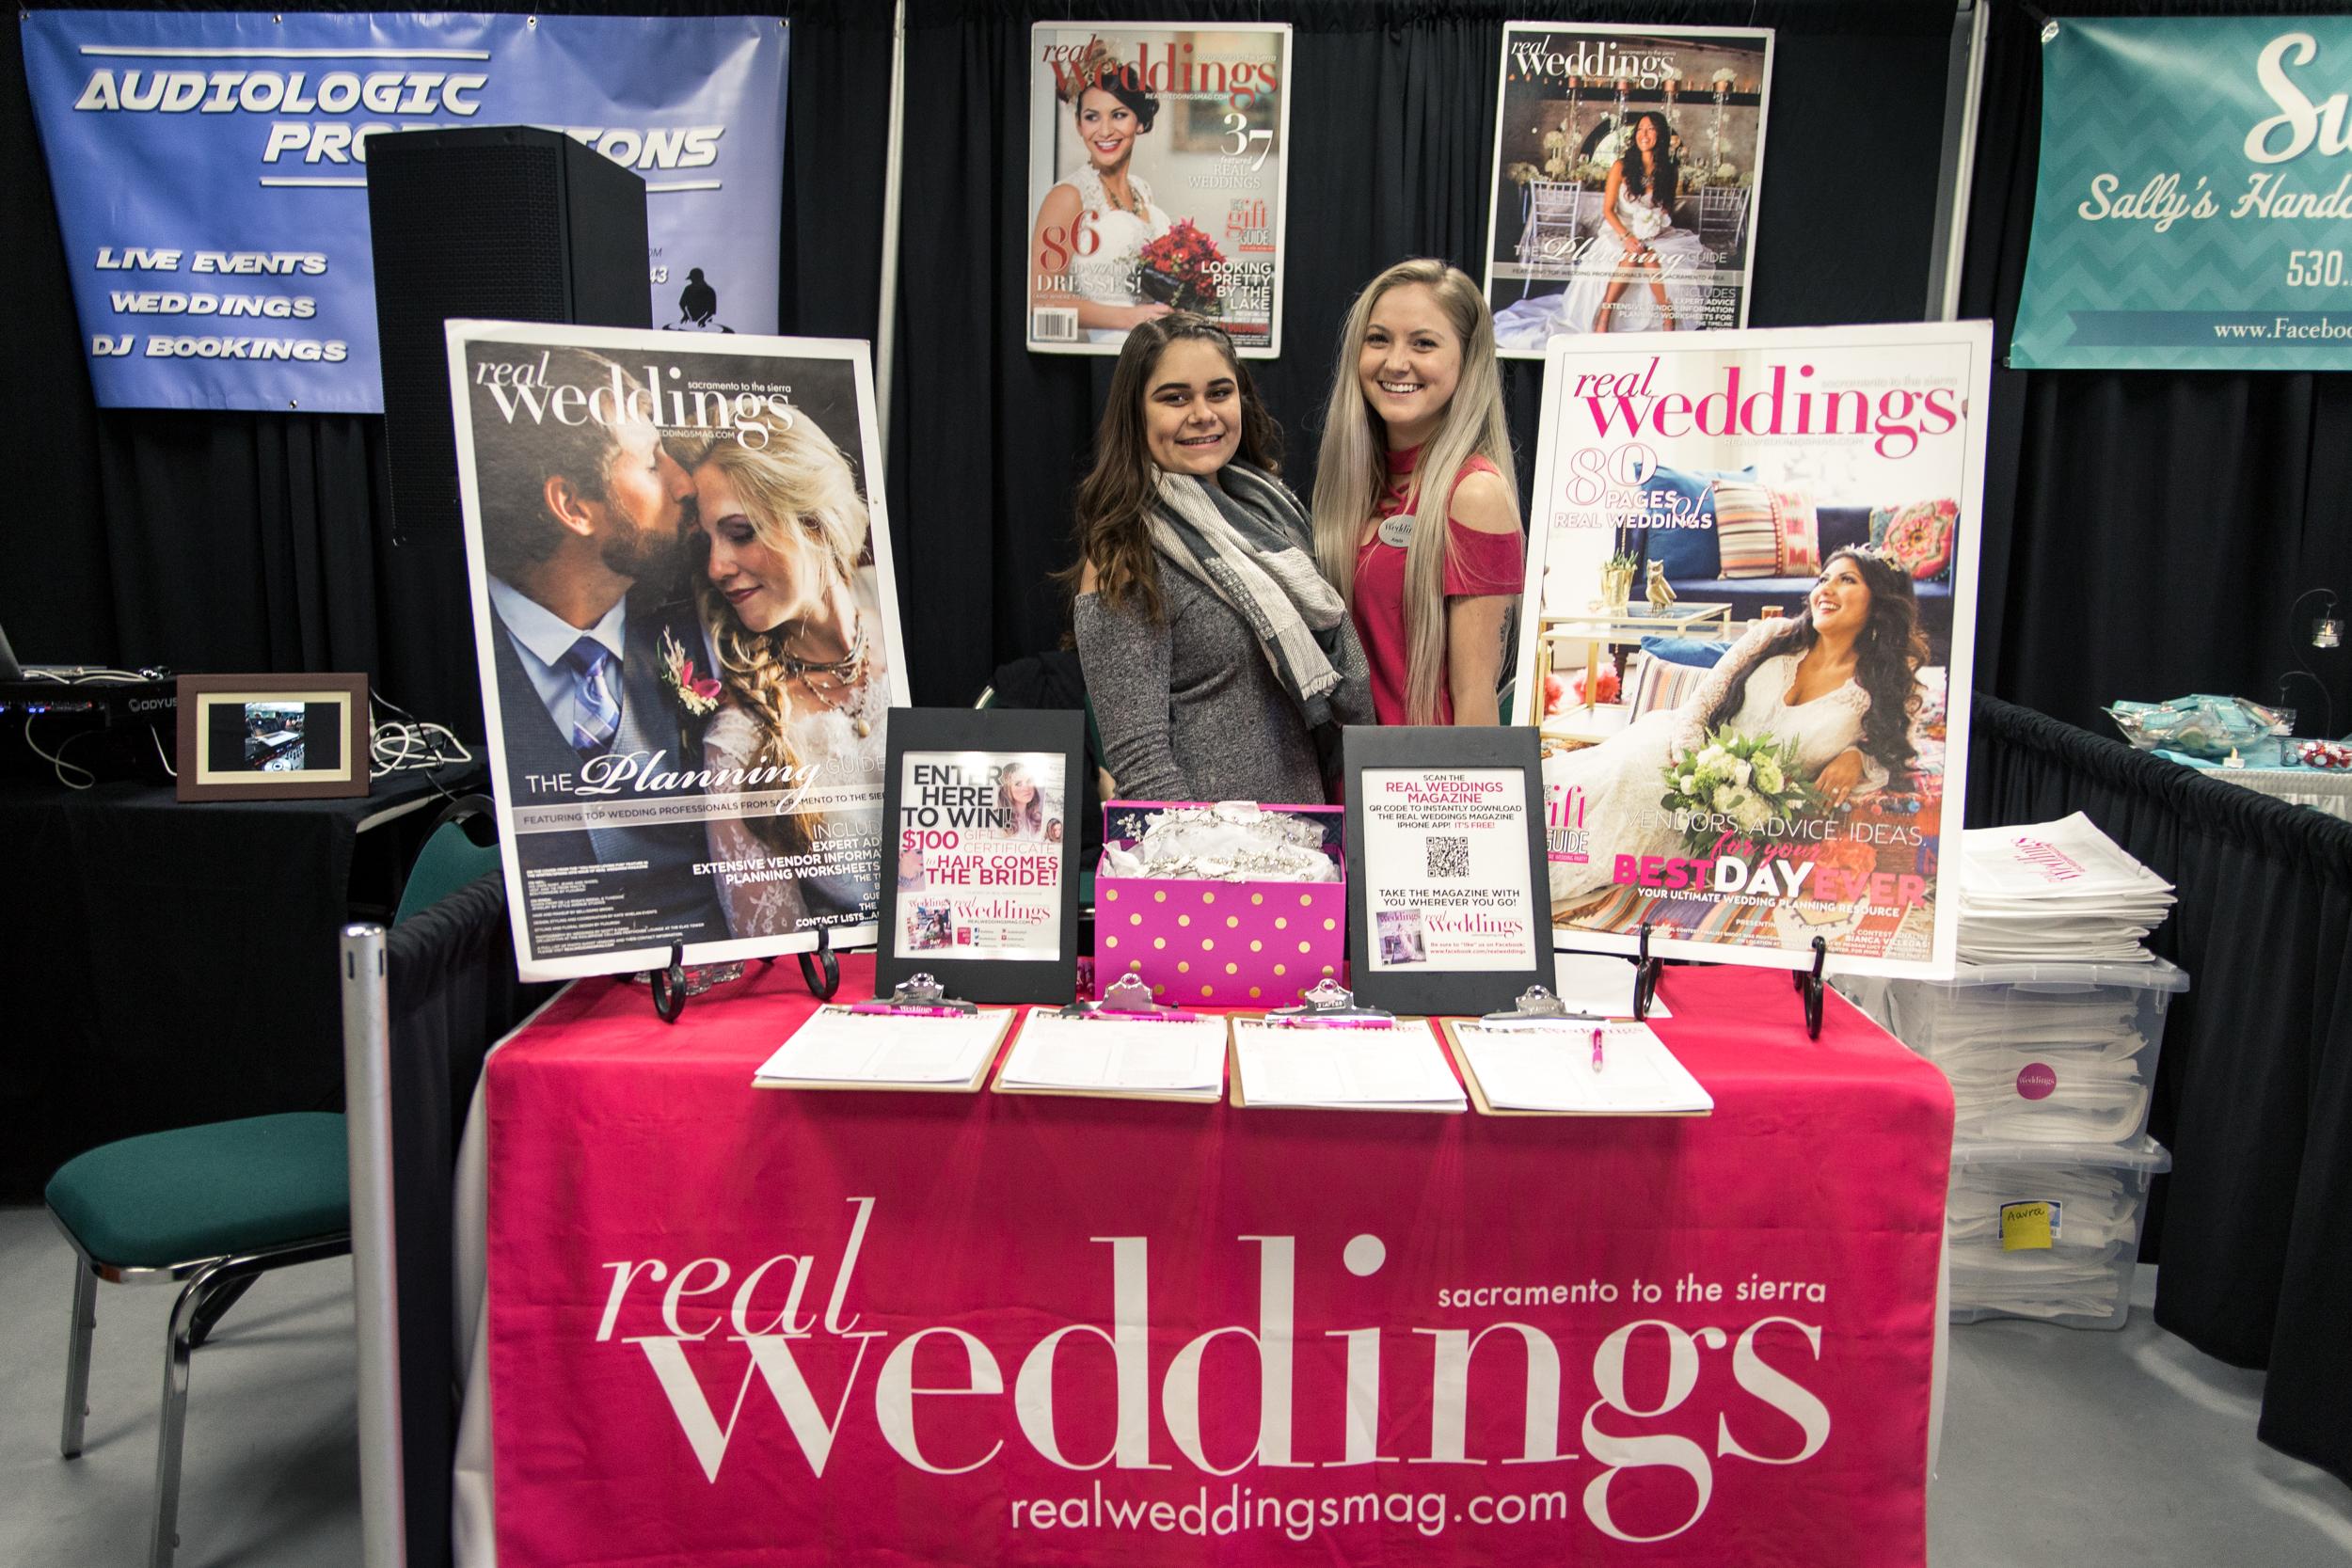 Real Weddings Magazine Redding Bridal Show Wedding Expo